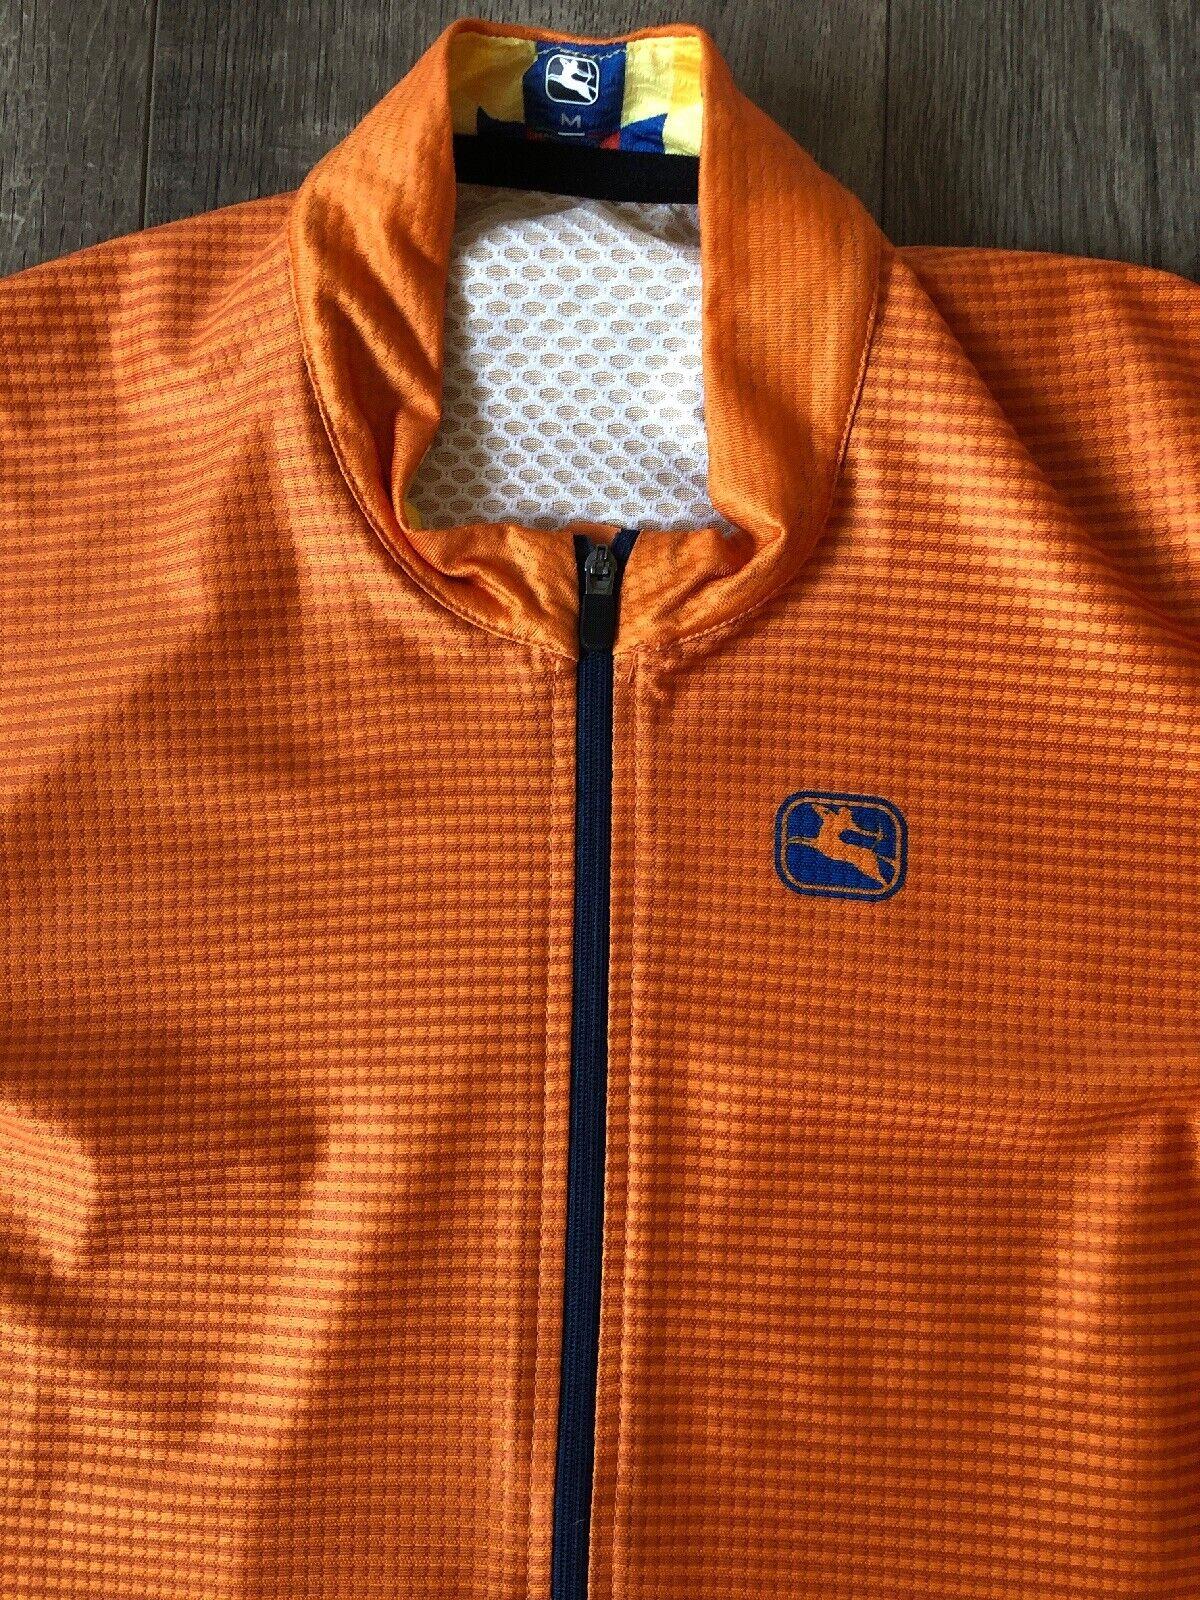 GIORDANA  FRC-PRO JERSEY MEN'S MEDIUM orange  up to 65% off